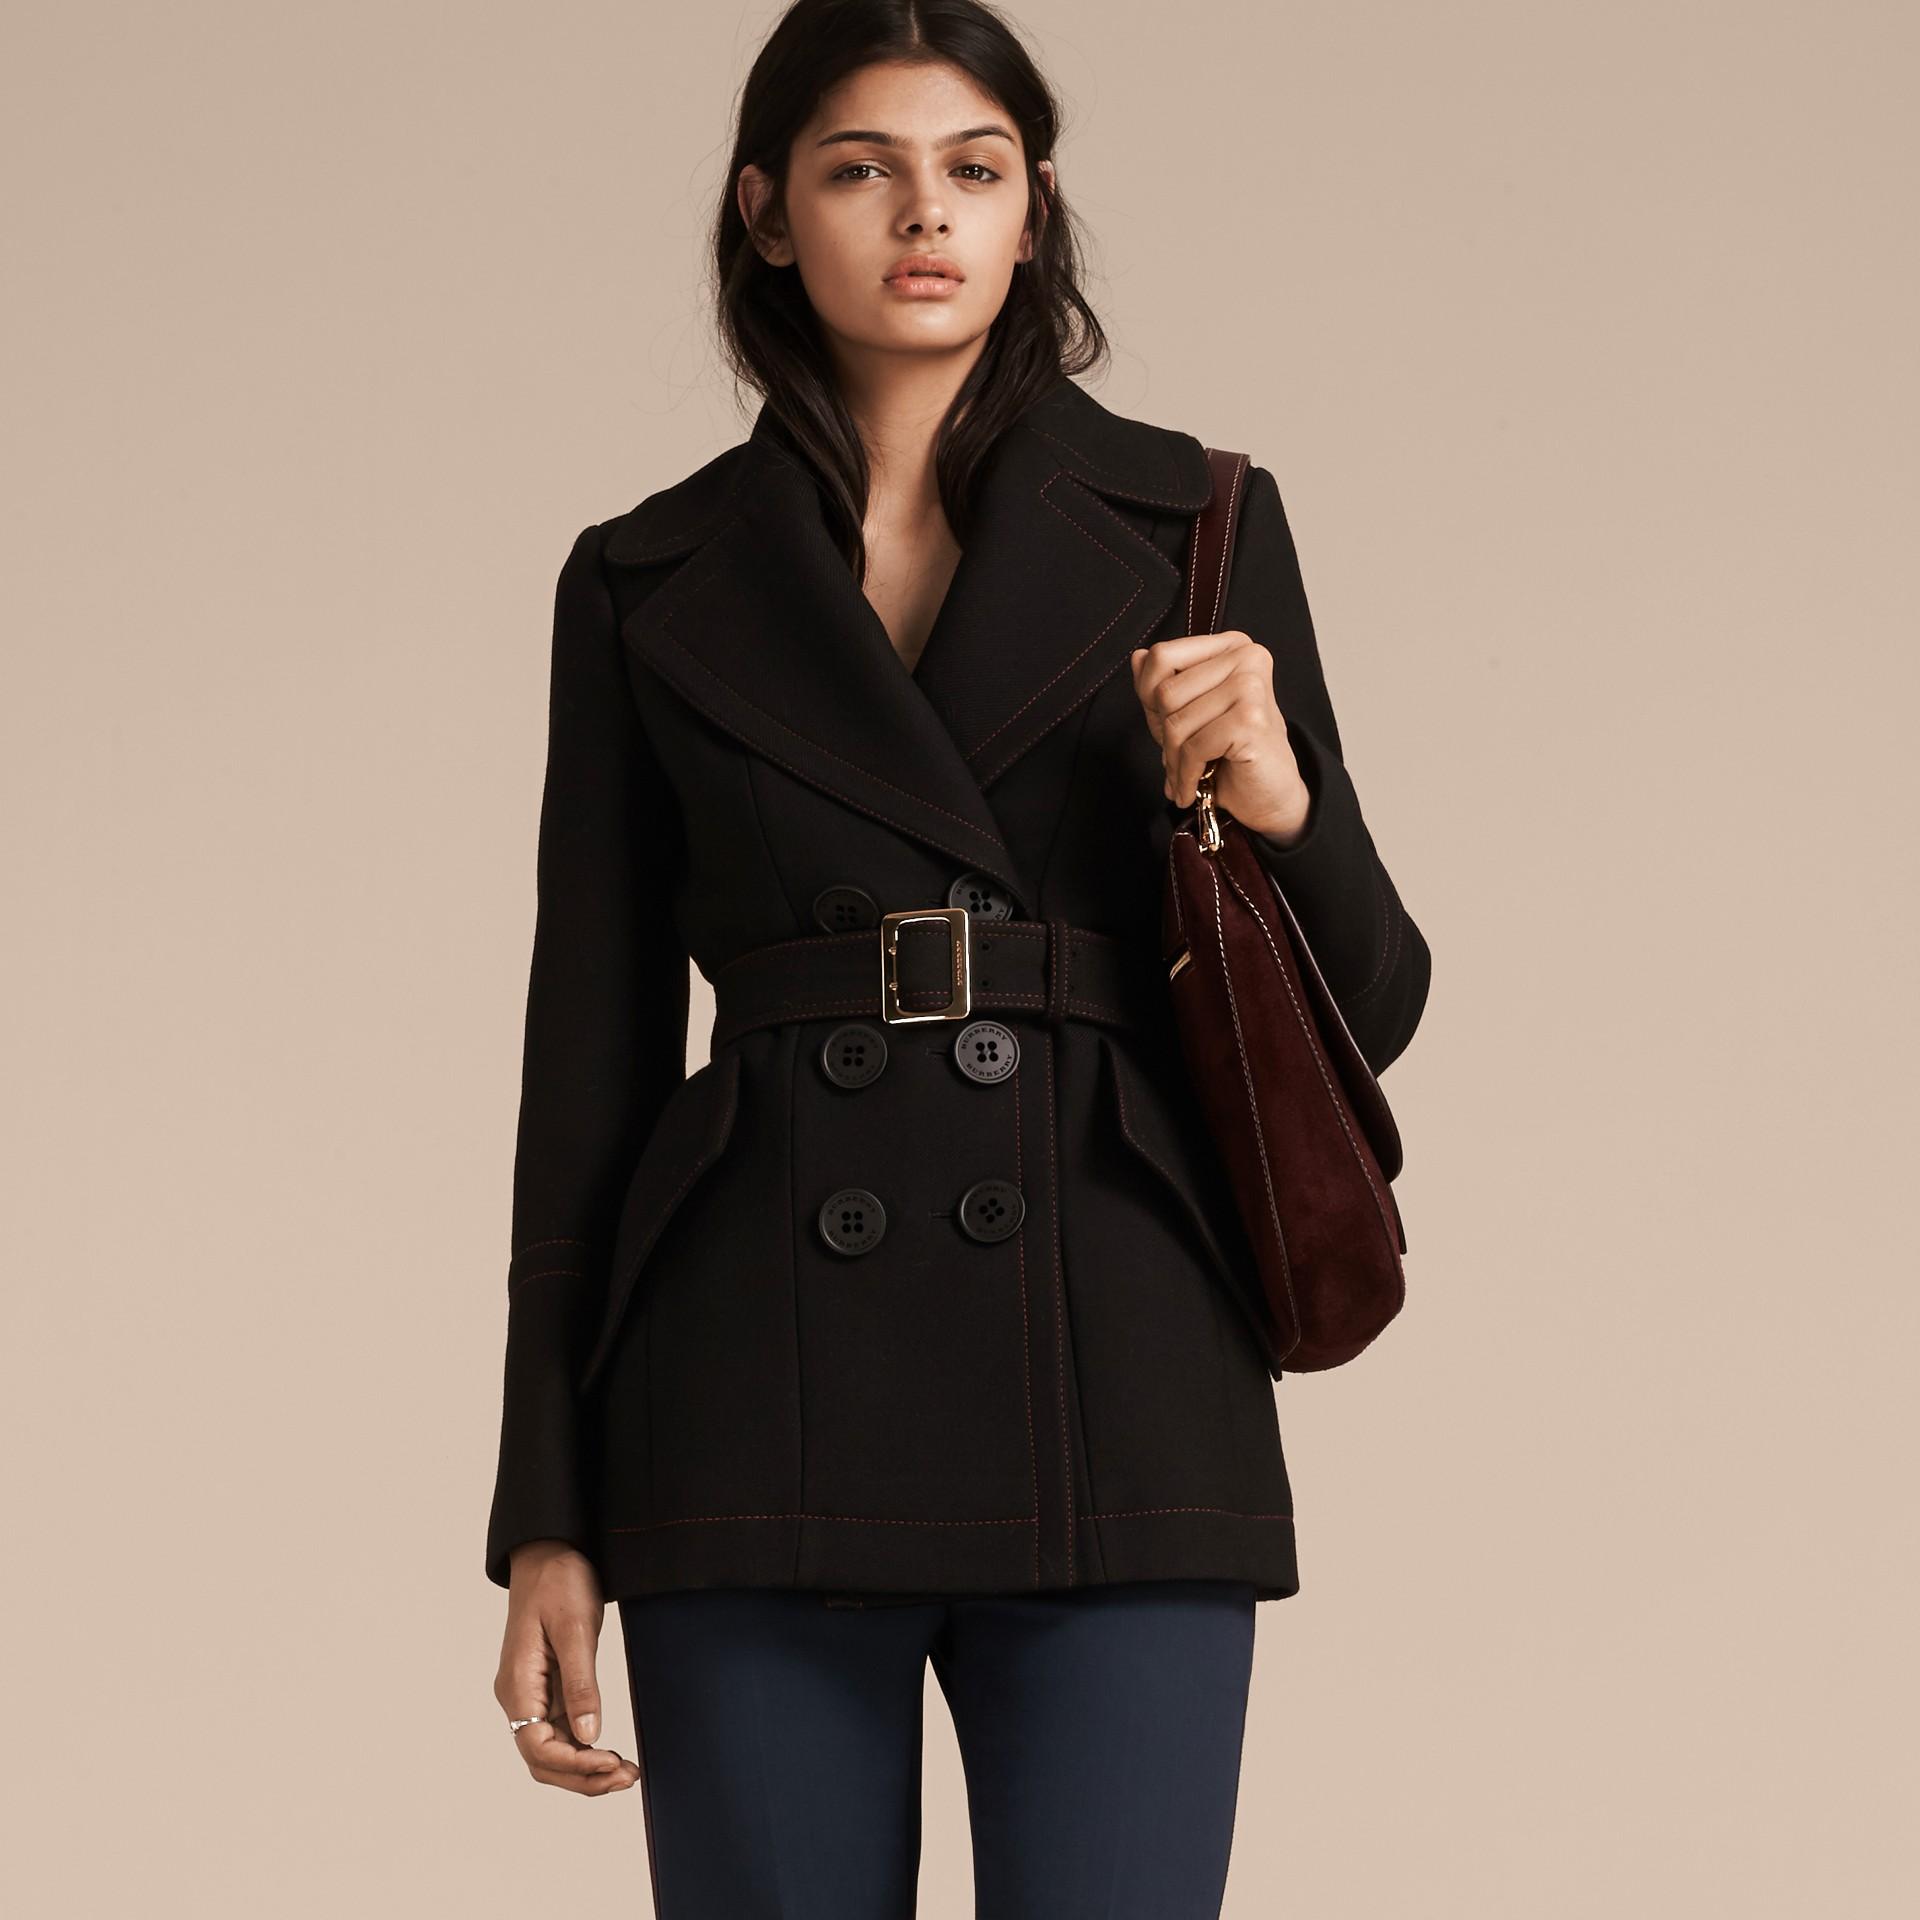 Black Wool Silk Pea Coat with Regimental Topstitching - gallery image 1